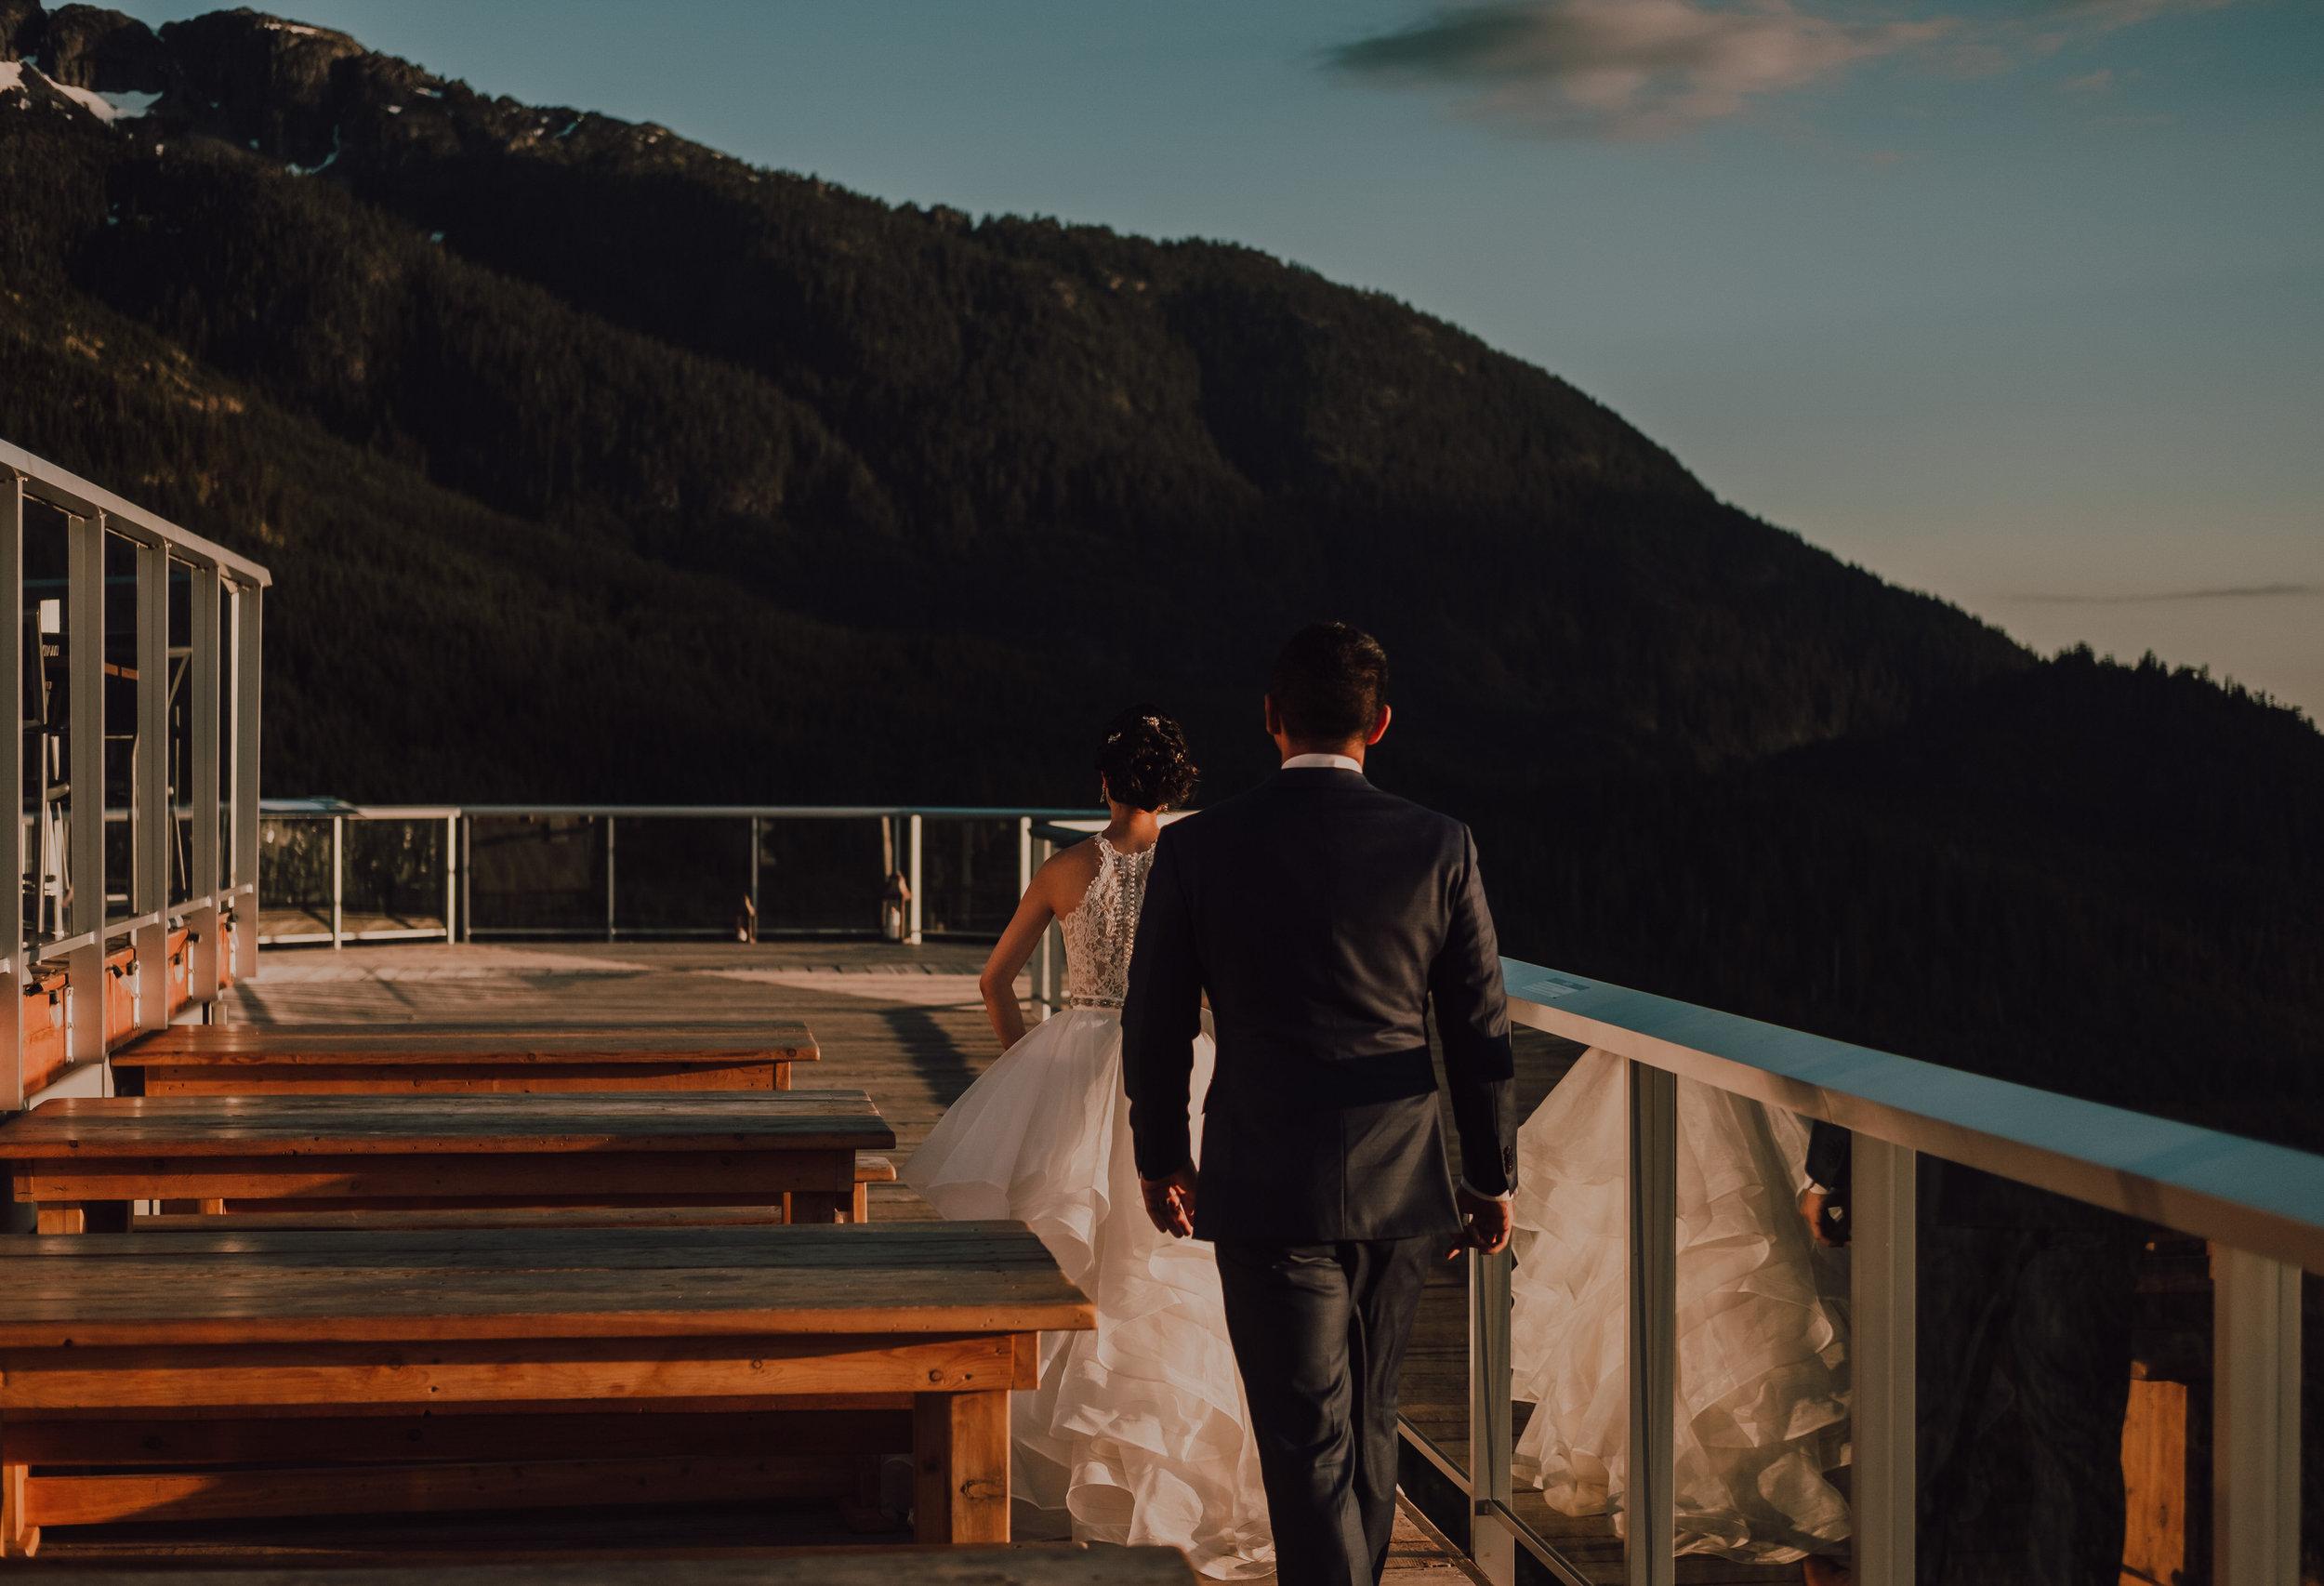 Squamish Wedding Photographer - Sea to Sky Gondola Wedding Photos -  Vancouver Wedding Photographer & Videographer - Sunshine Coast Wedding Photos - Sunshine Coast Wedding Photographer - Jennifer Picard Photography - DSCF8329.jpg